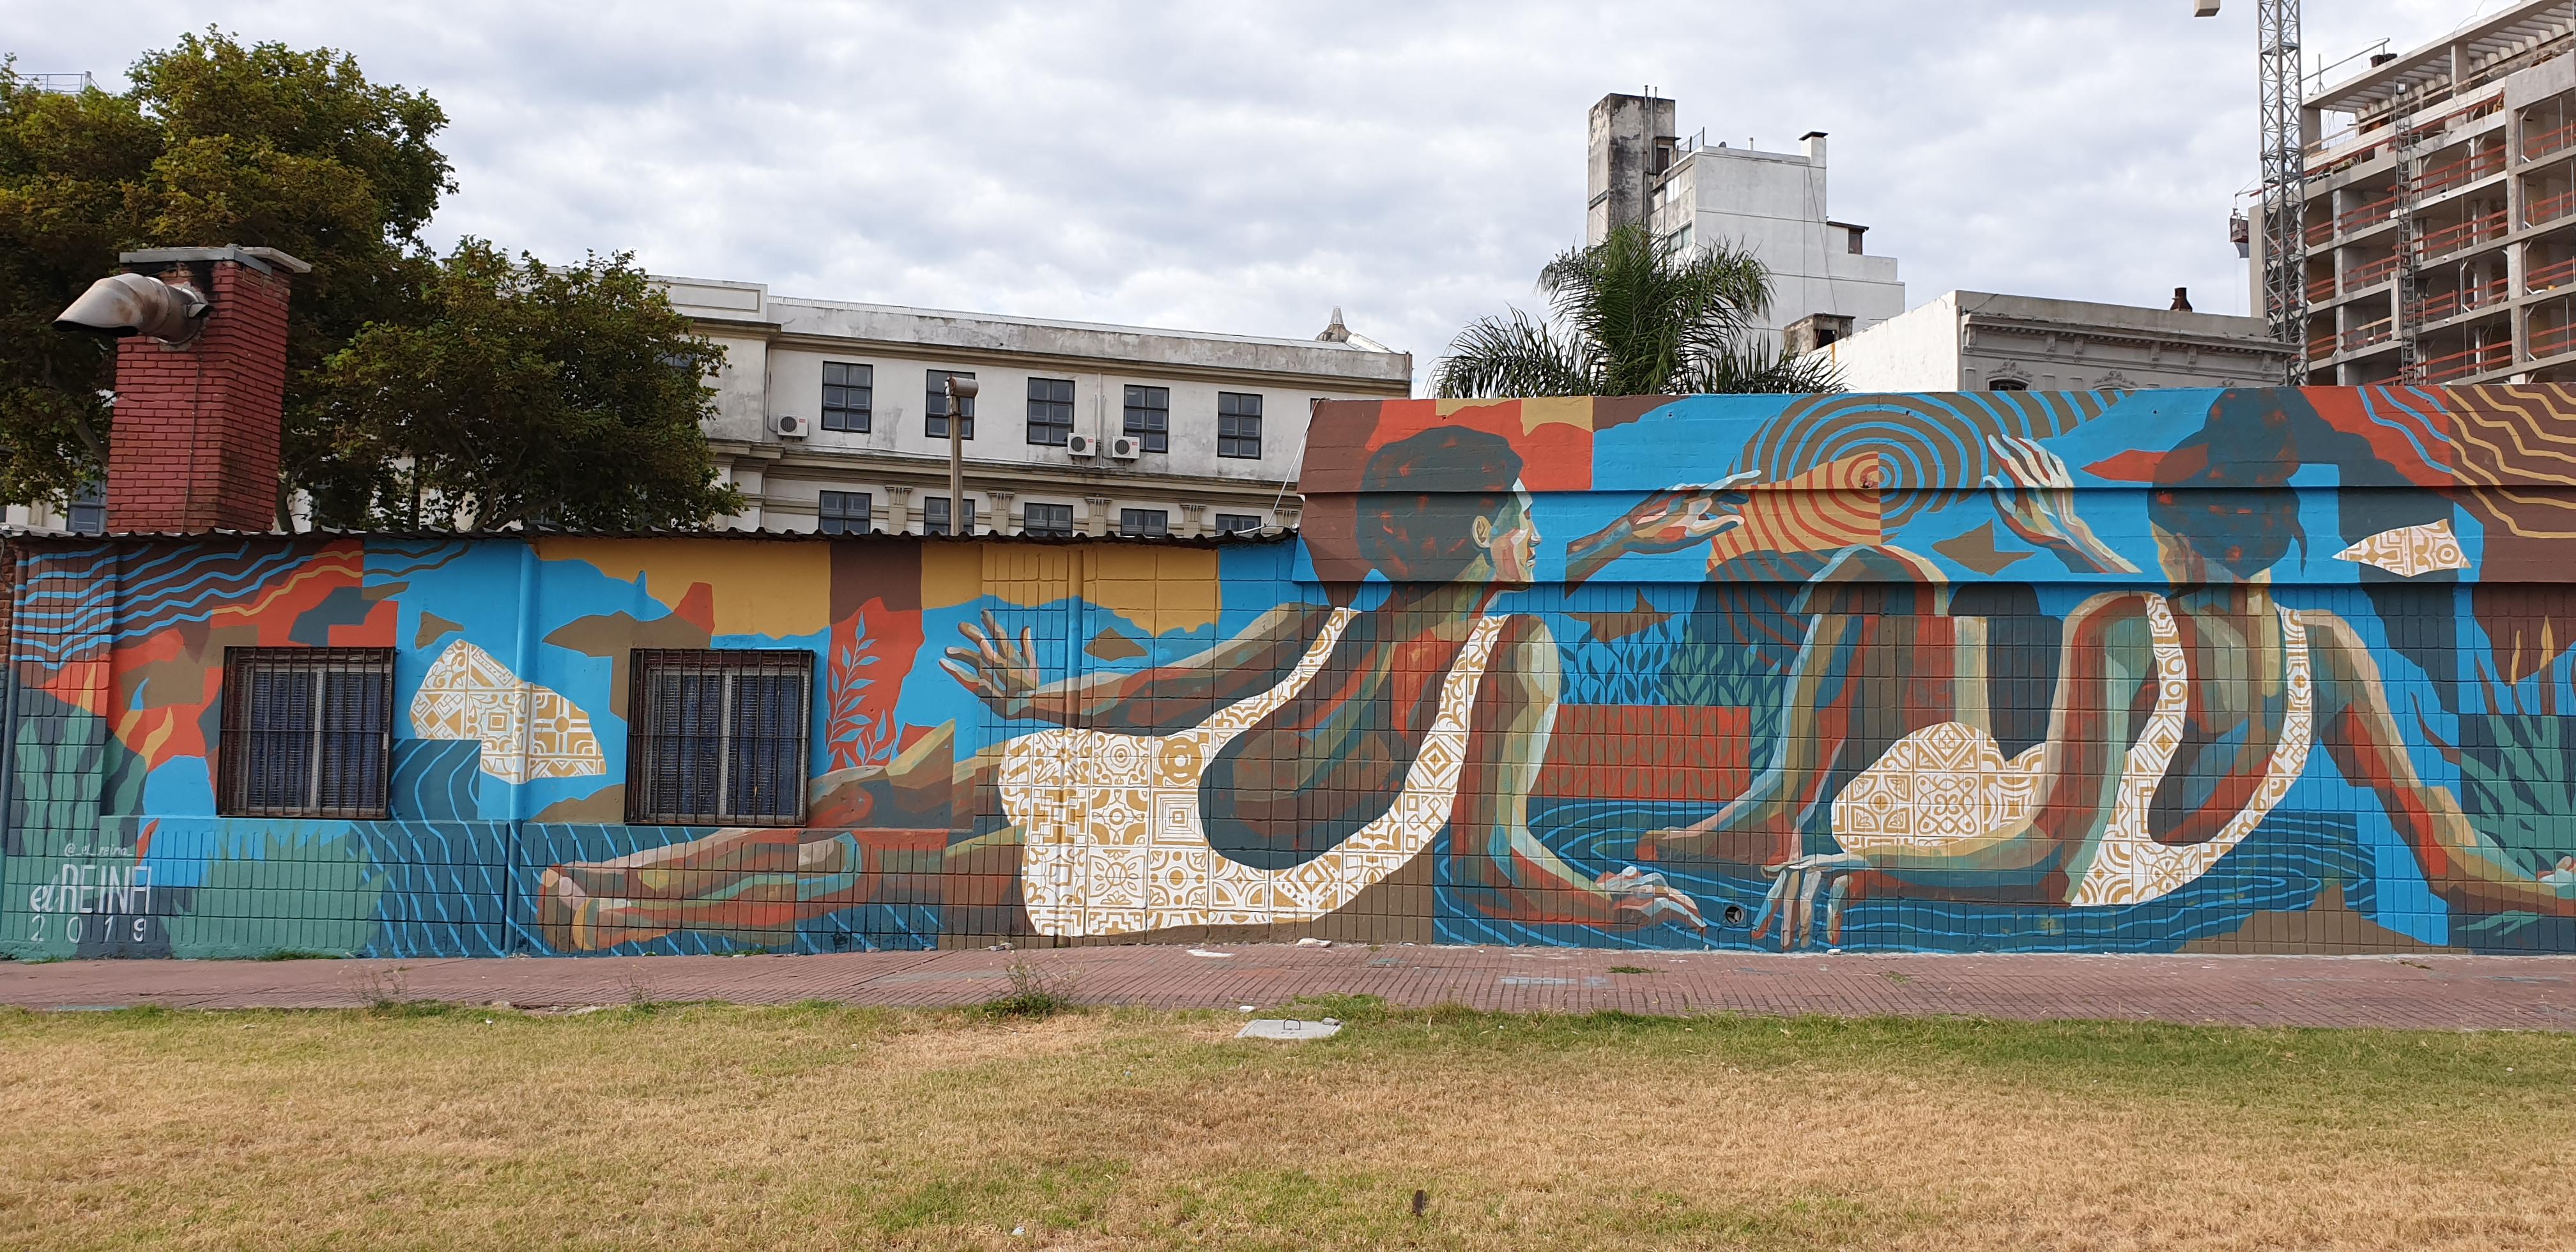 Mur réalisé par Leandro Bustamante Reina - Montevideo - Uruguay 2020 - ©nofakeinmynews.com